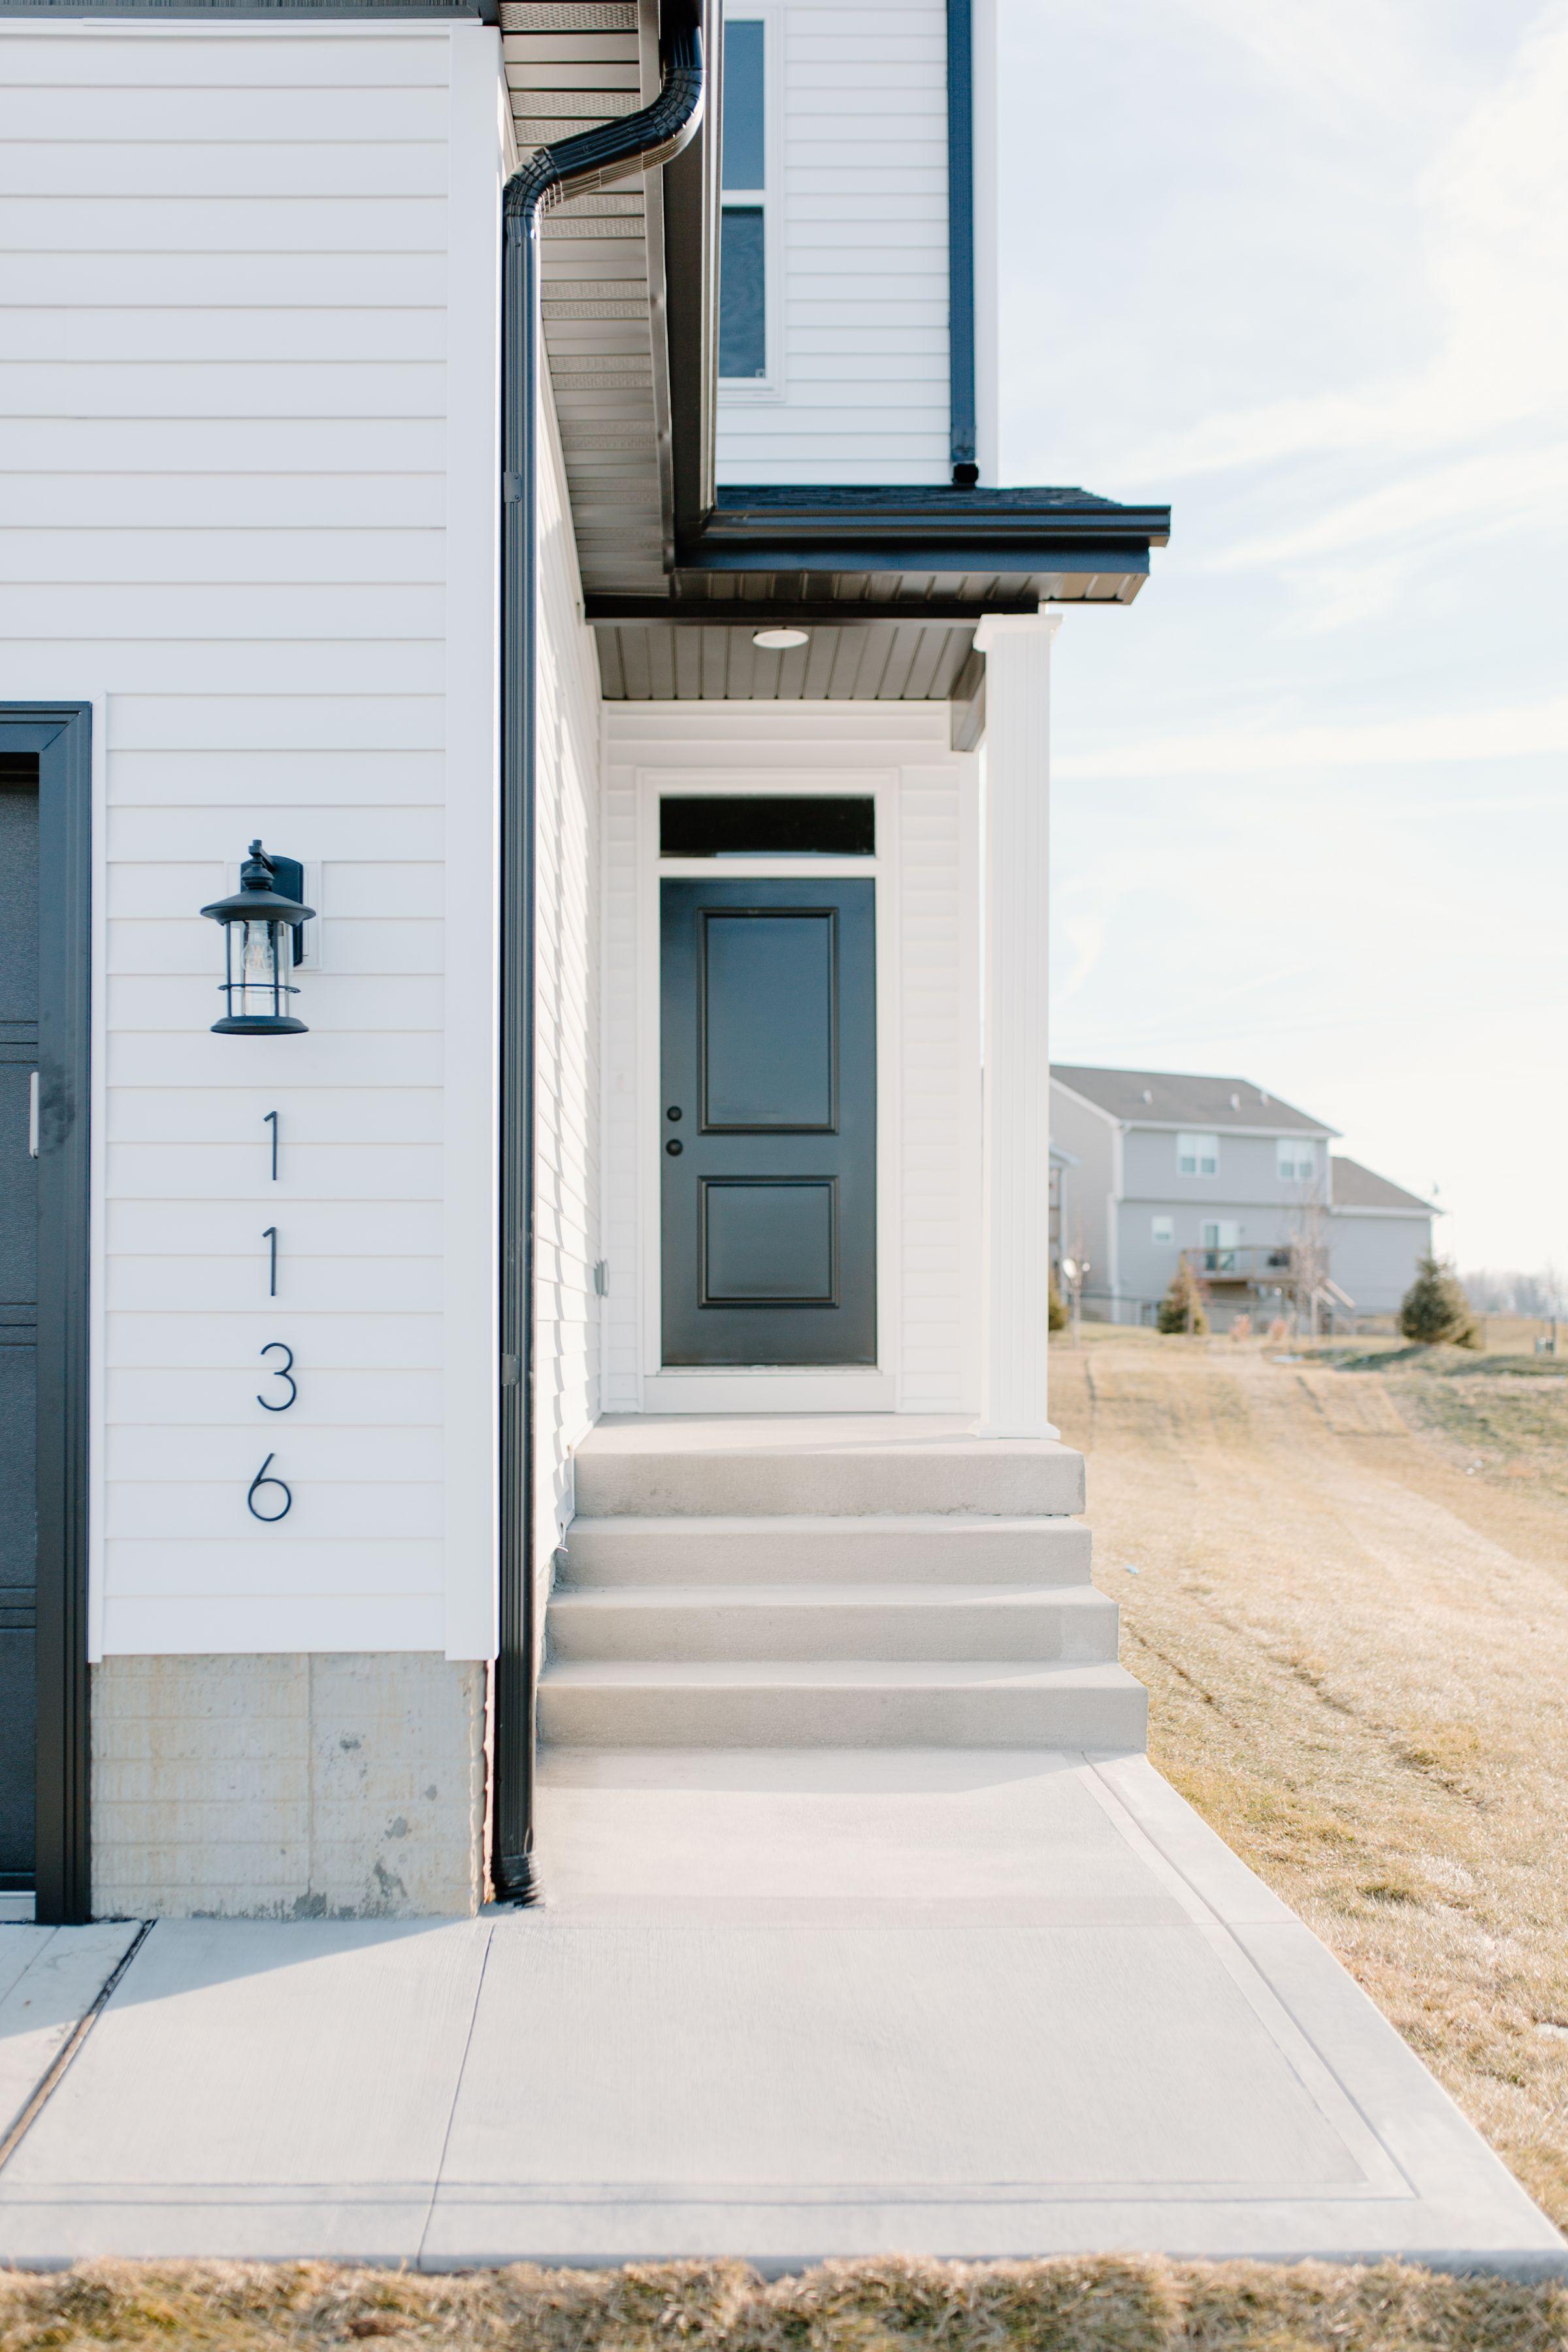 residential-warren-county-iowa-0-acres-listing-number-15138-3-2020-12-28-170245.jpg